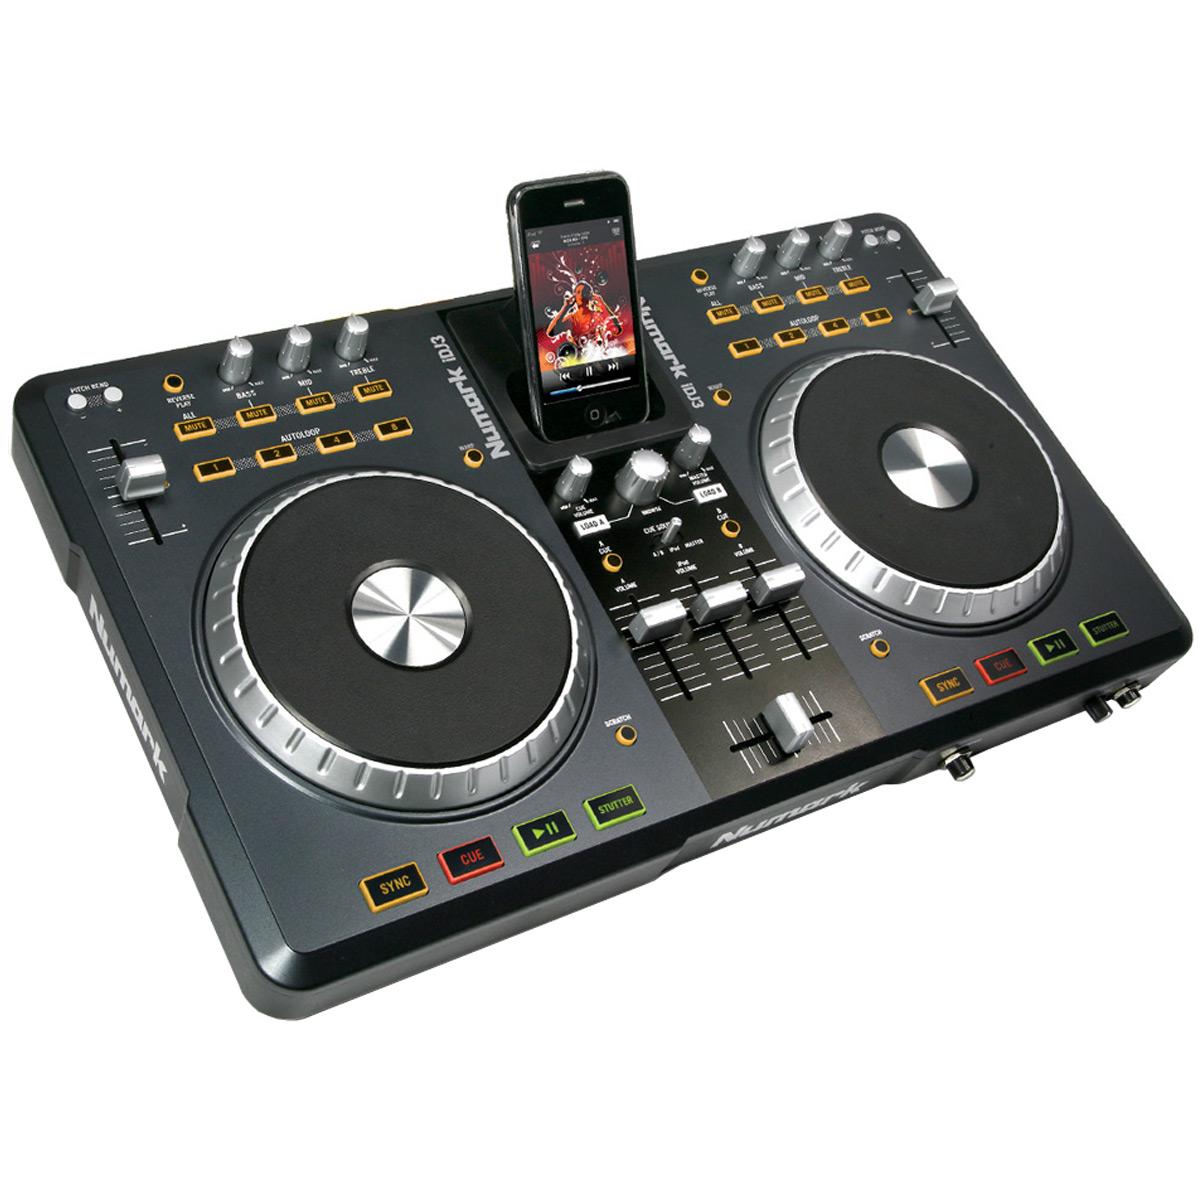 iDJ3 - Controladora DJ c/ Dock p/ iPod iDJ3 - Numark